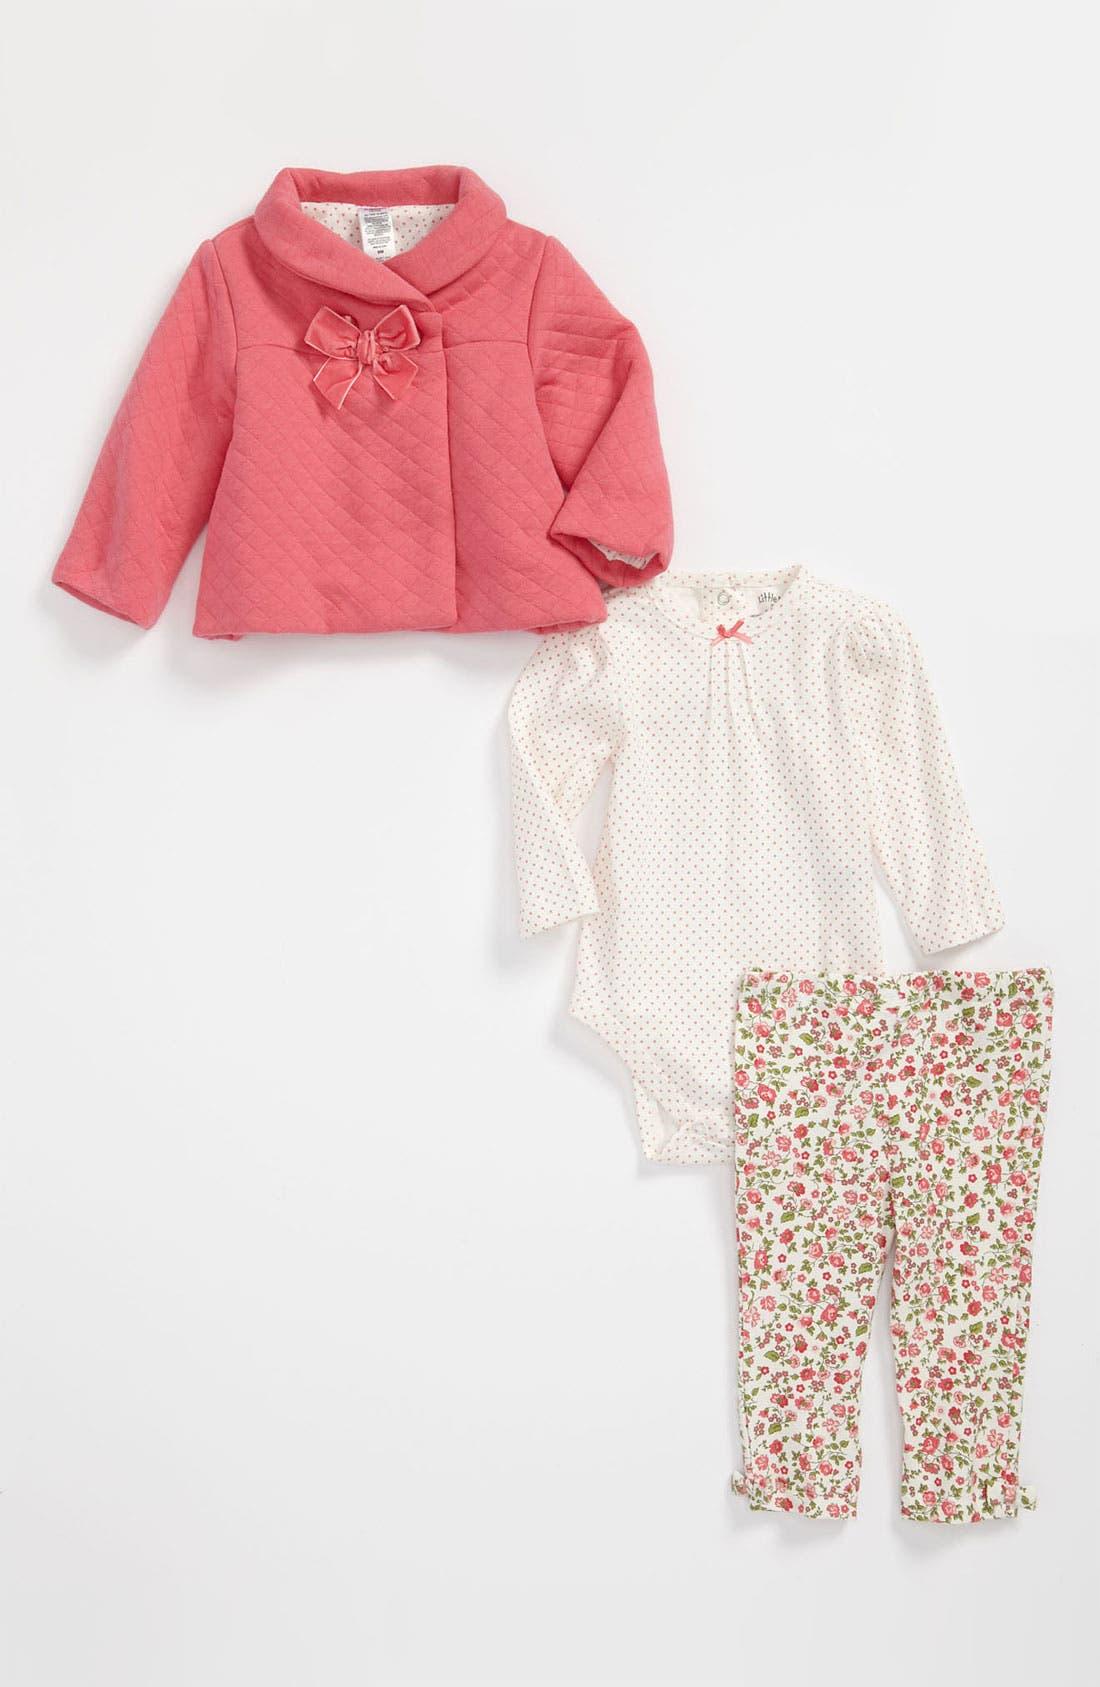 Alternate Image 1 Selected - Little Me 'Pretty Floral' Top, Leggings & Jacket (Infant)